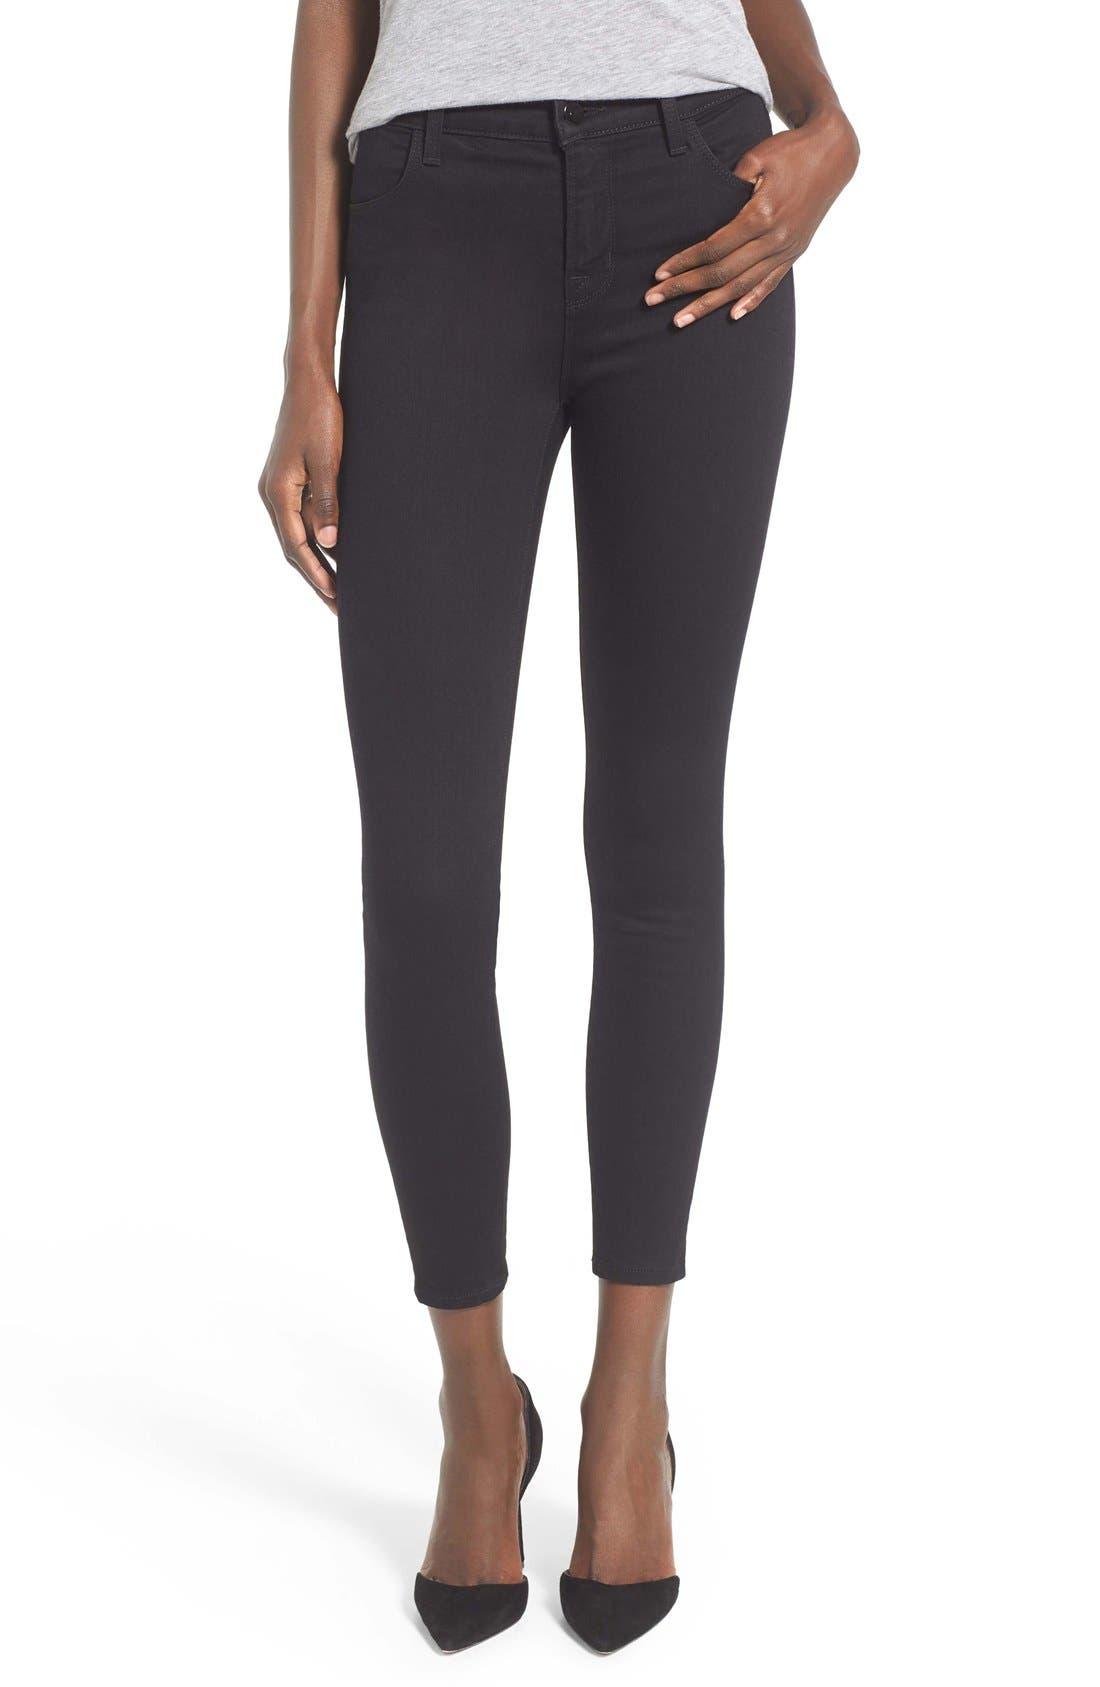 Alternate Image 1 Selected - J Brand Alana High Waist Crop Skinny Jeans (Vanity)